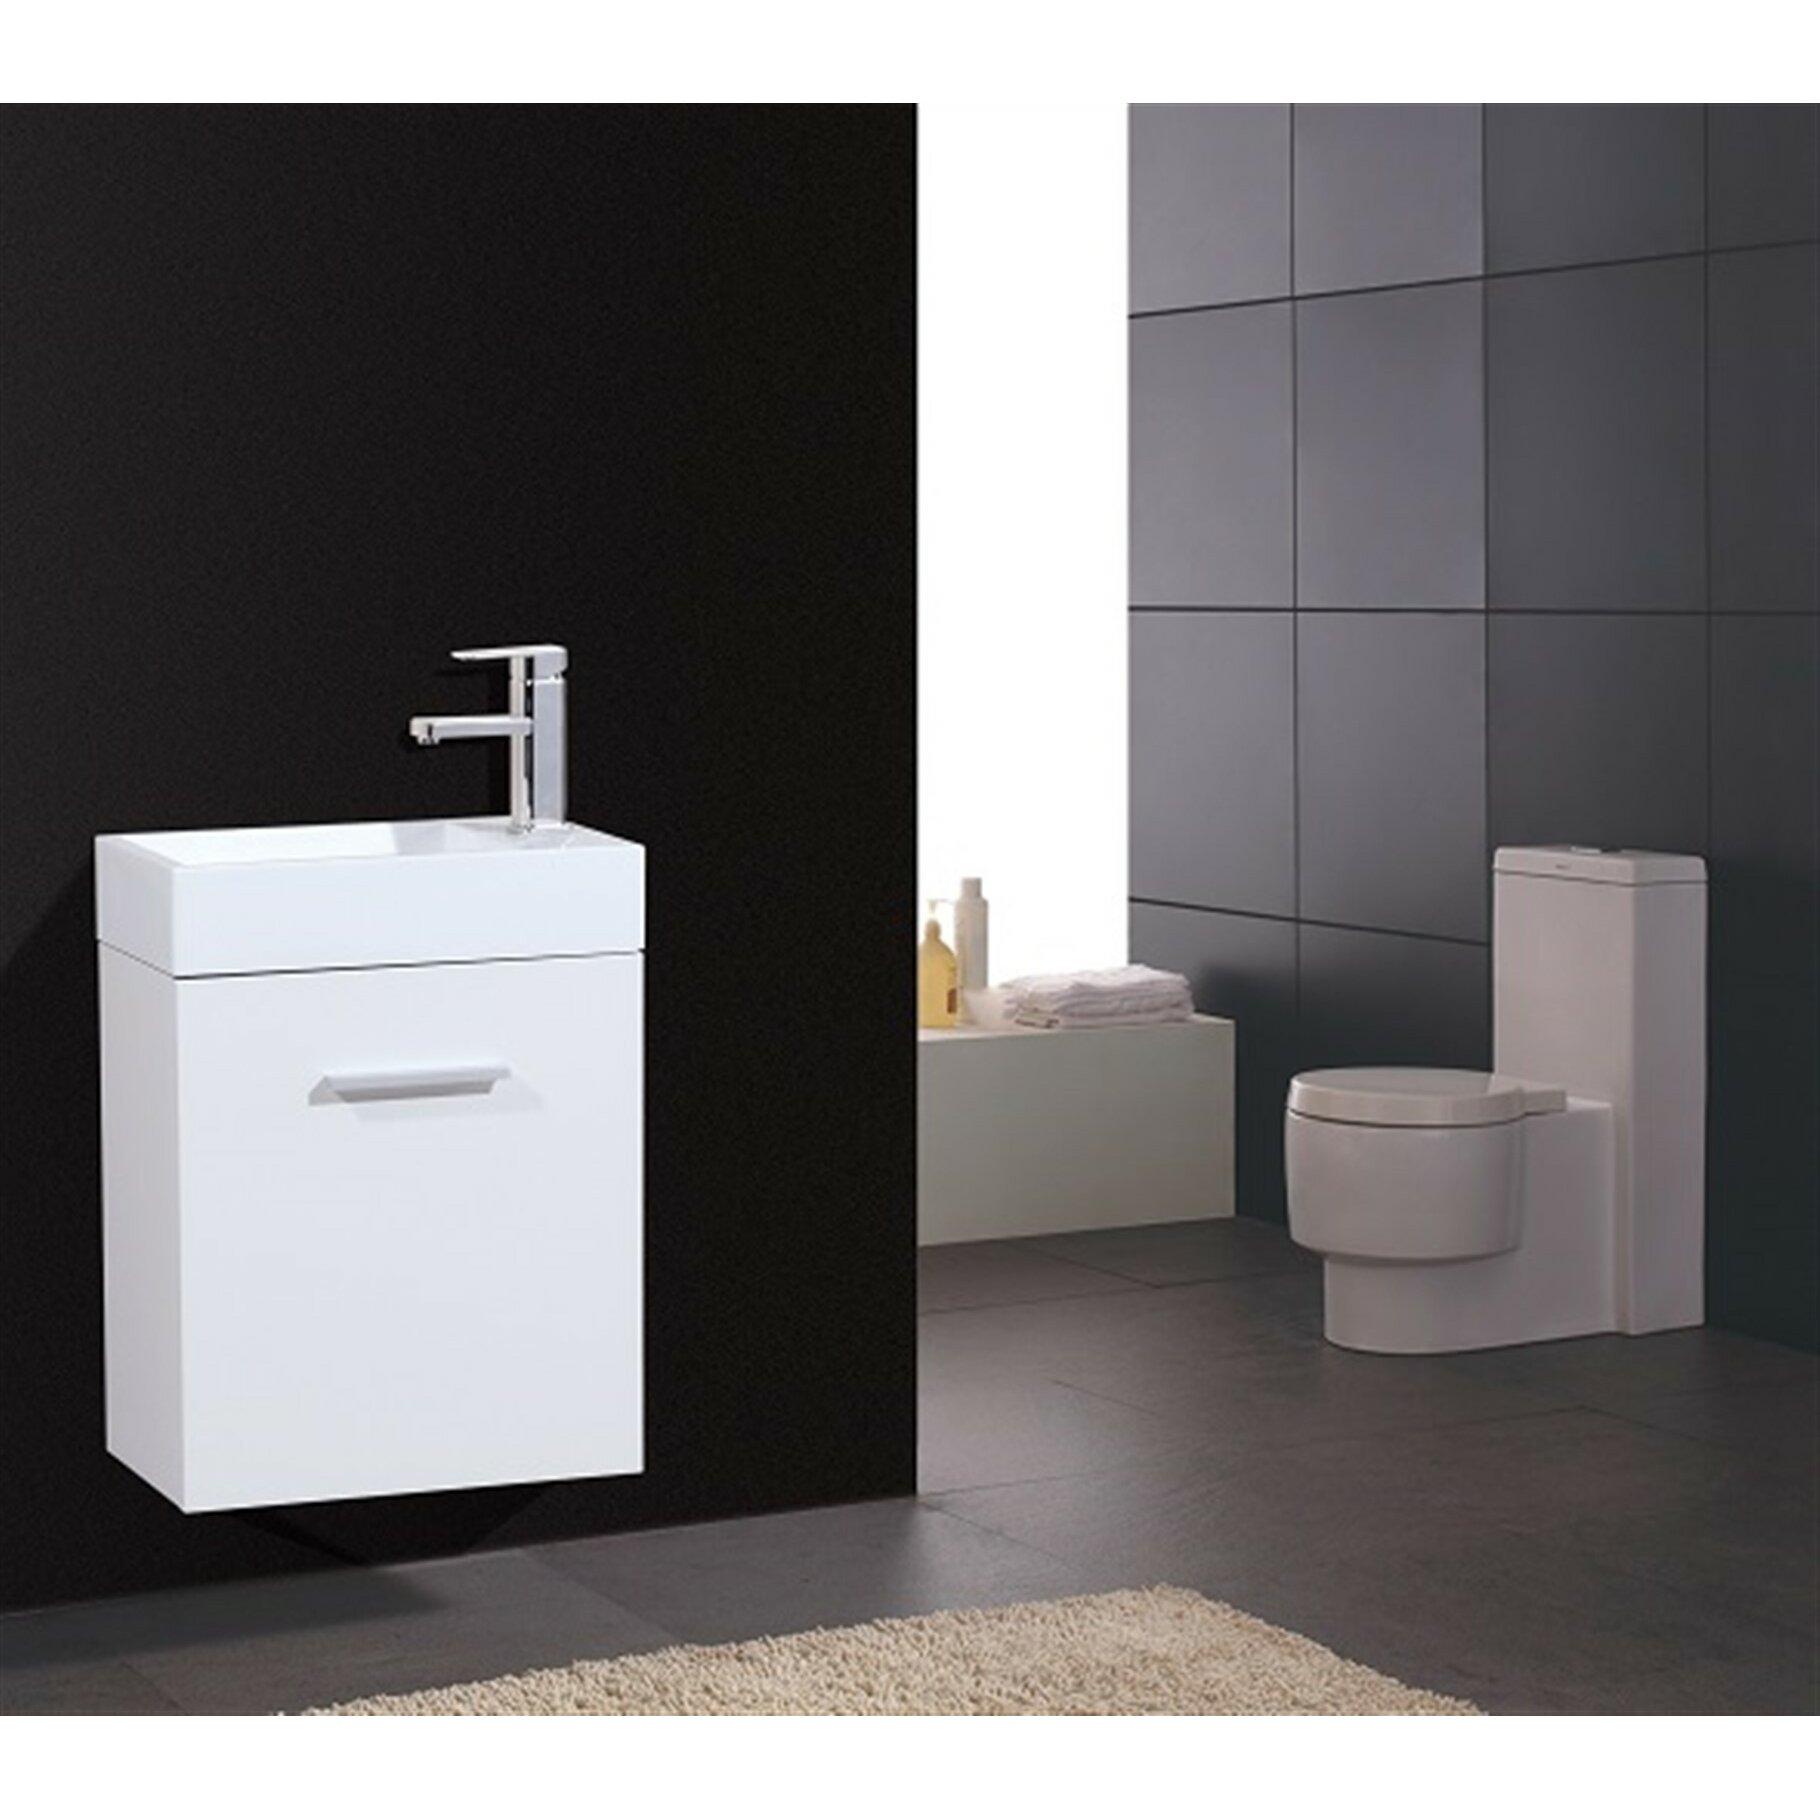 Kube bath bliss 18 single wall mount modern bathroom - Contemporary bathroom vanity sets ...